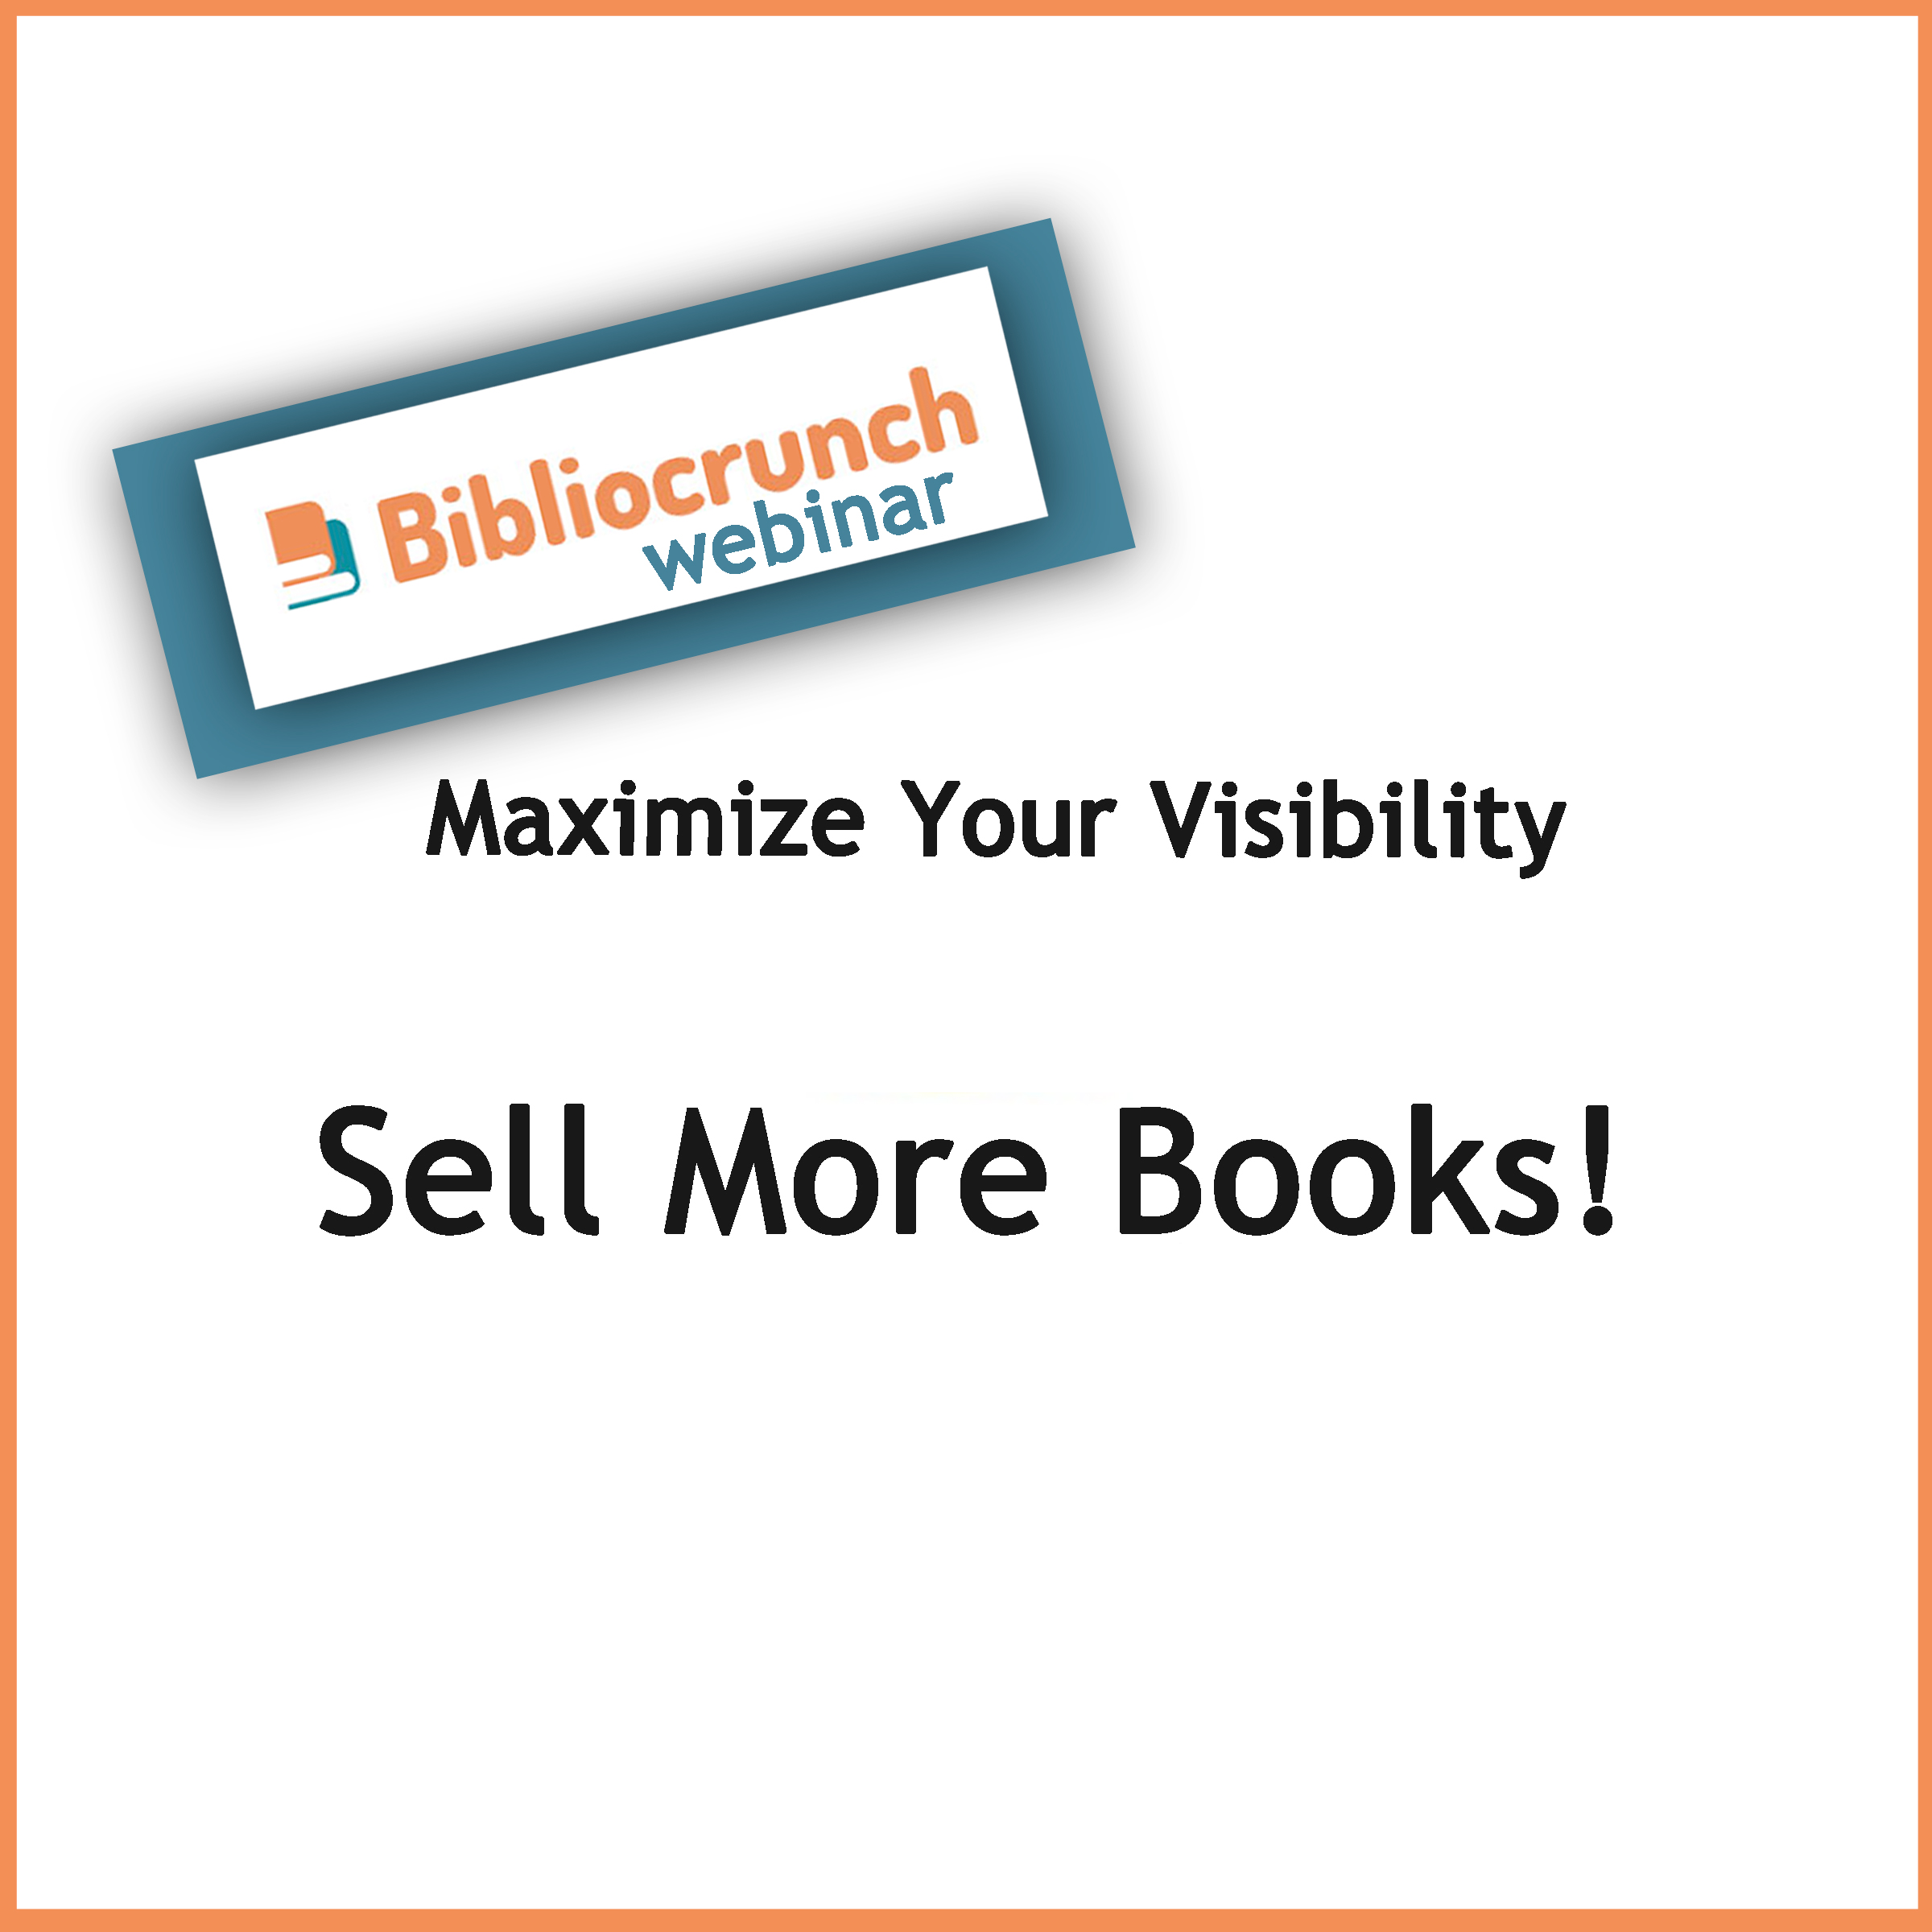 Home myidentifiers learn book marketing fast fandeluxe Choice Image